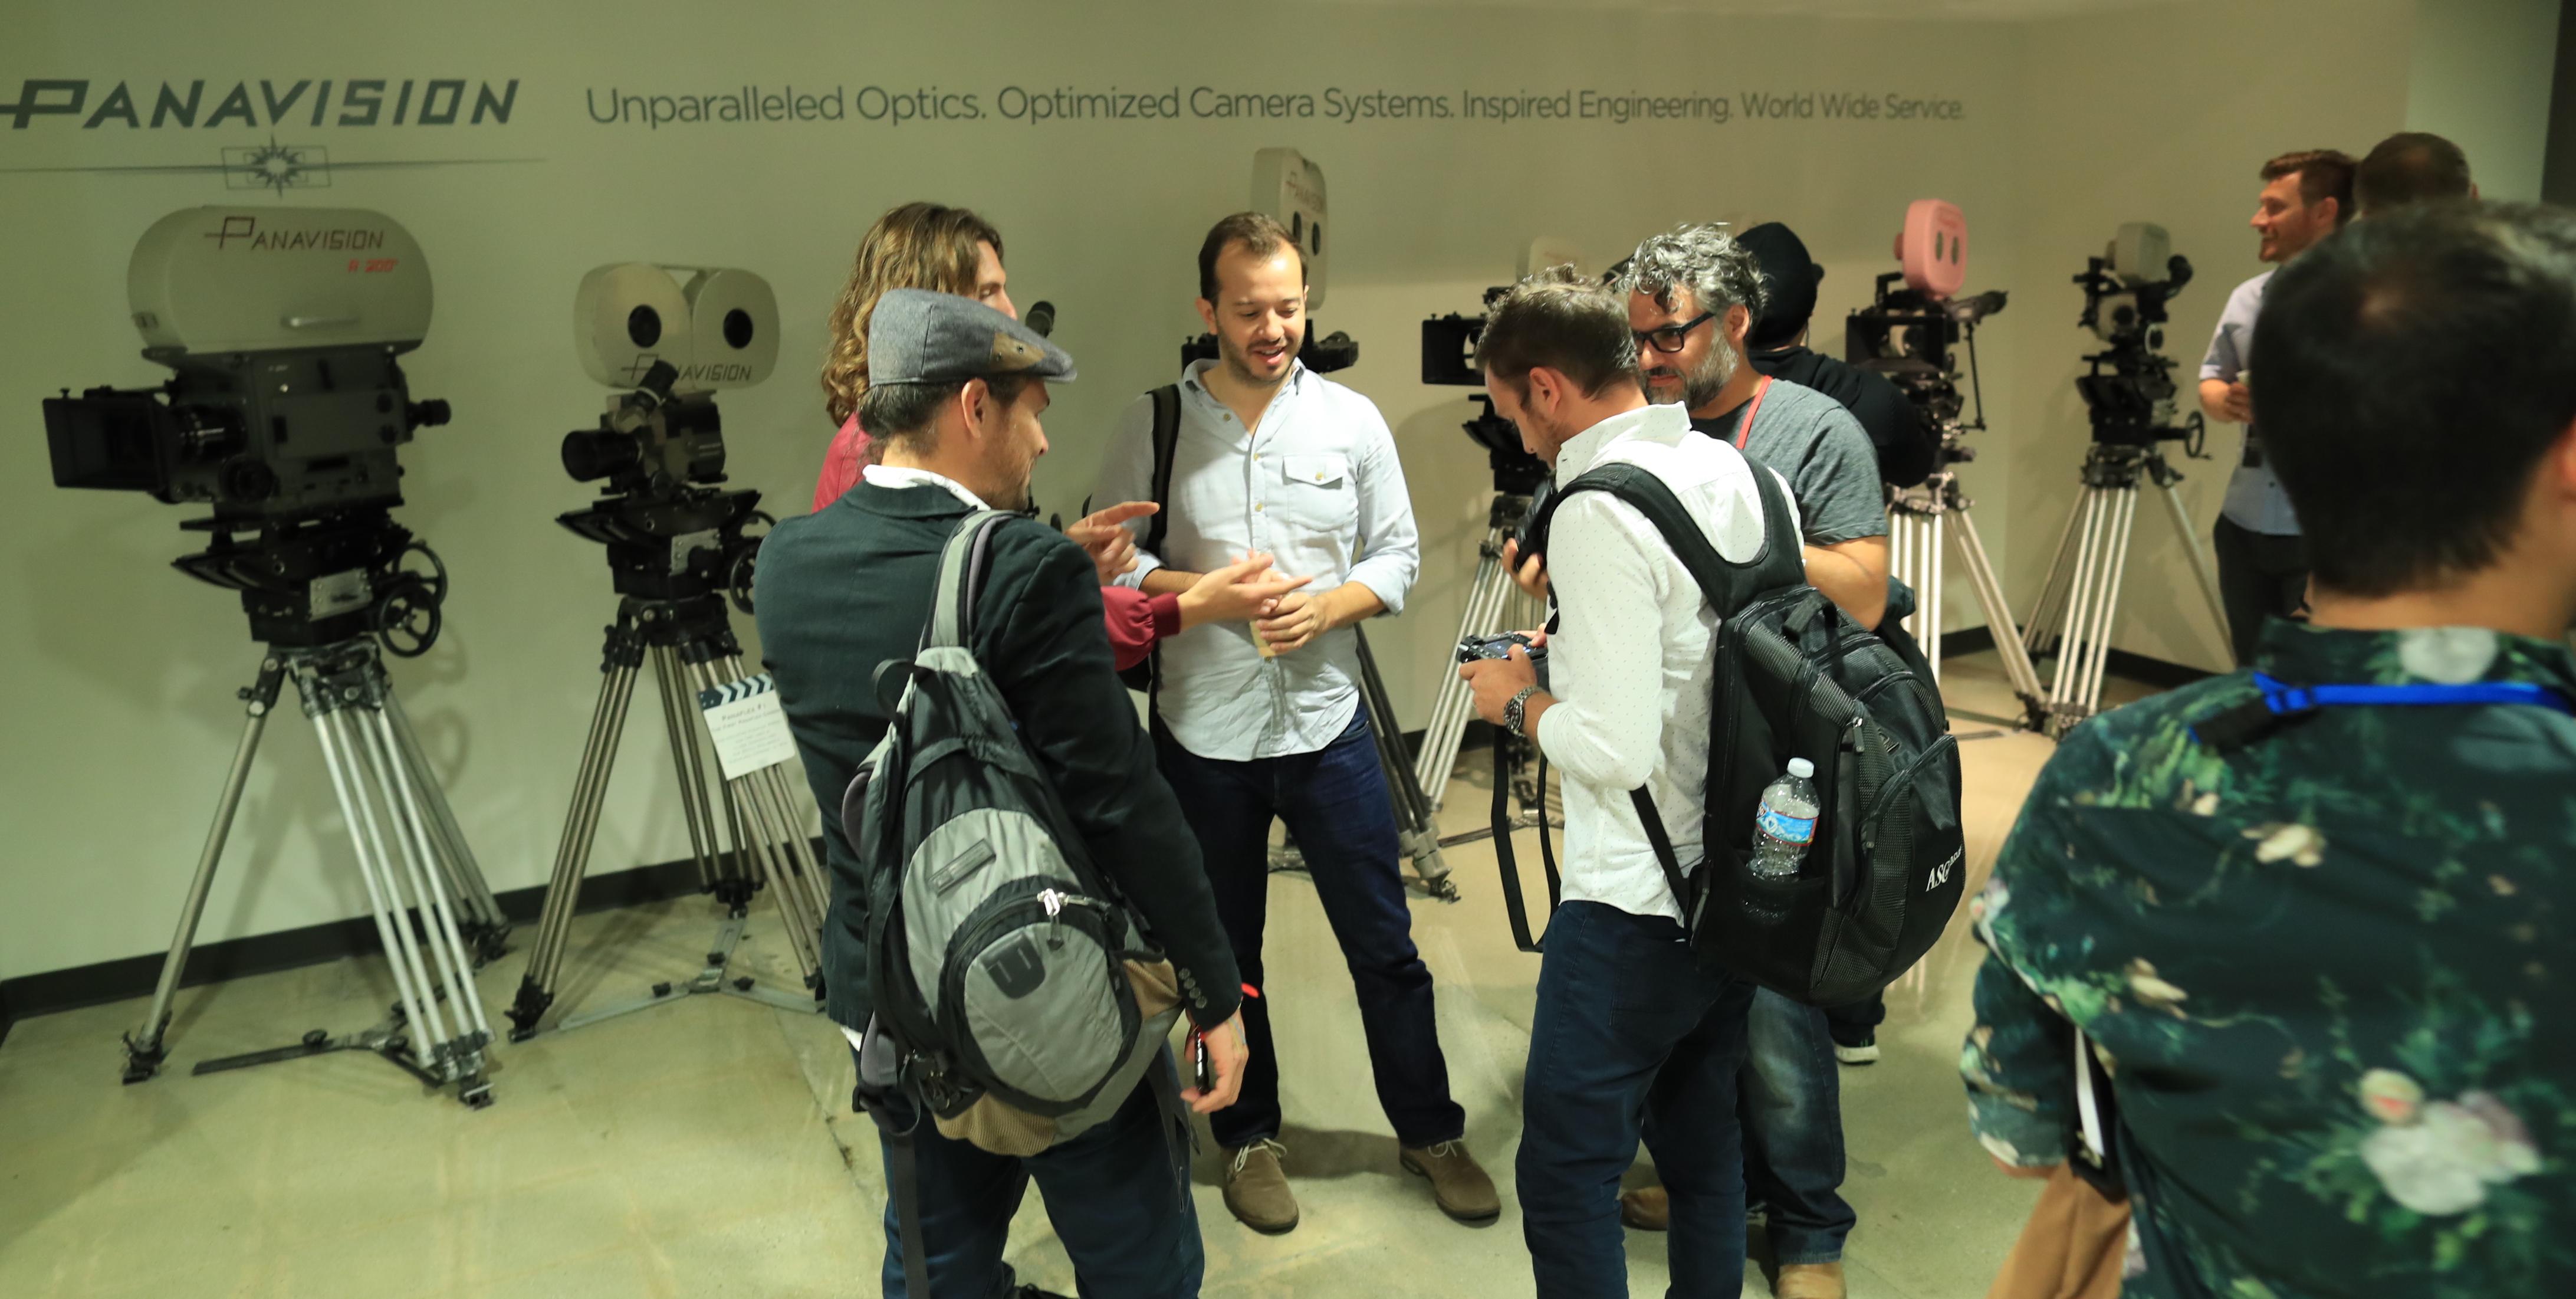 ICS participants gather inside. Photo by James Neihouse, ASC